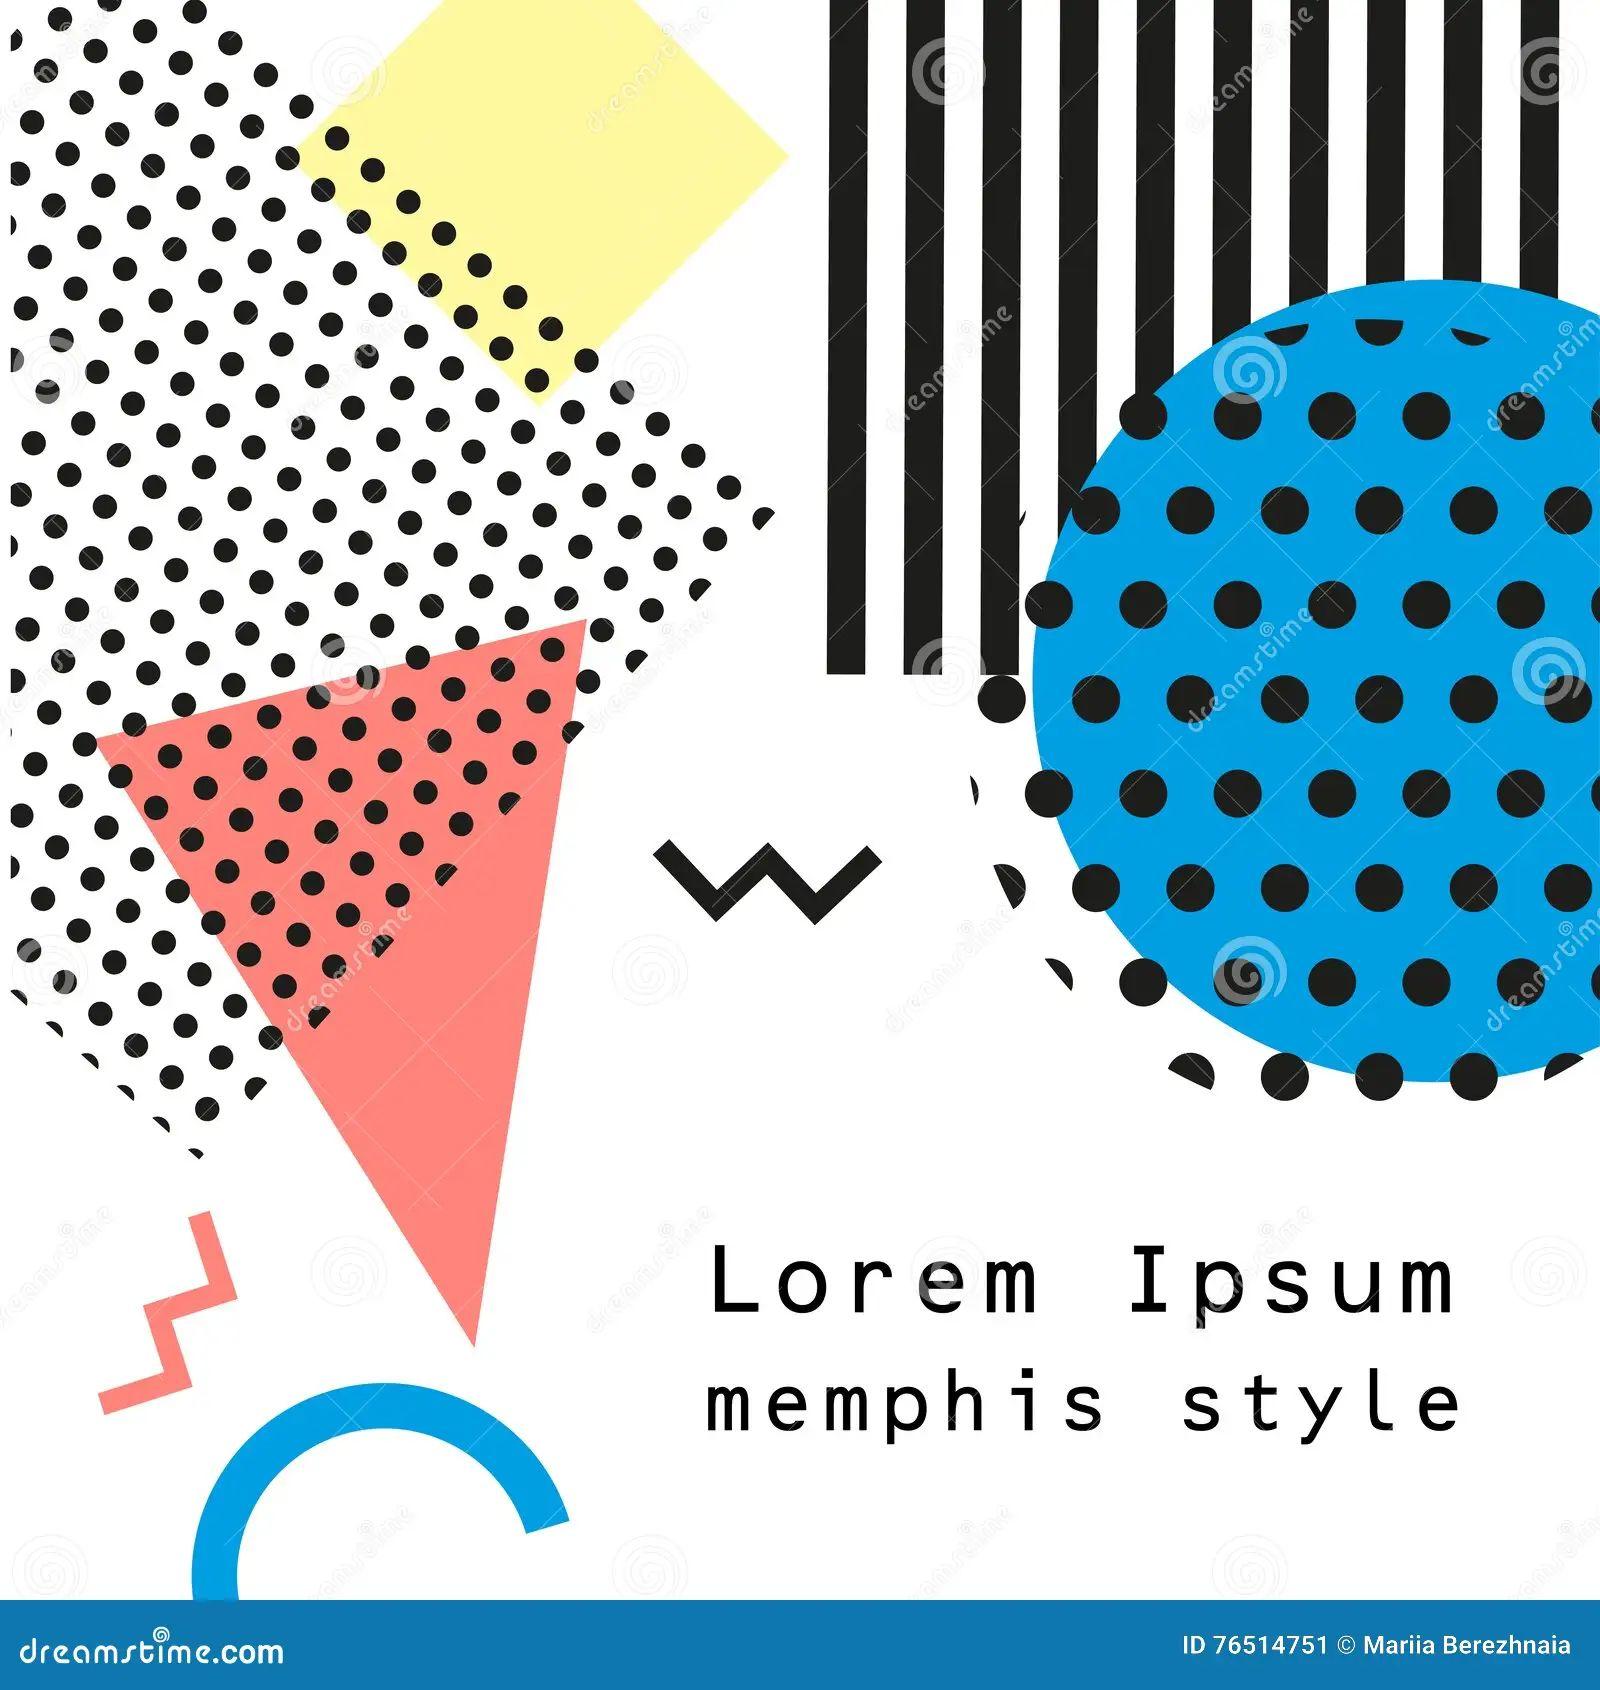 90s poster design - Download